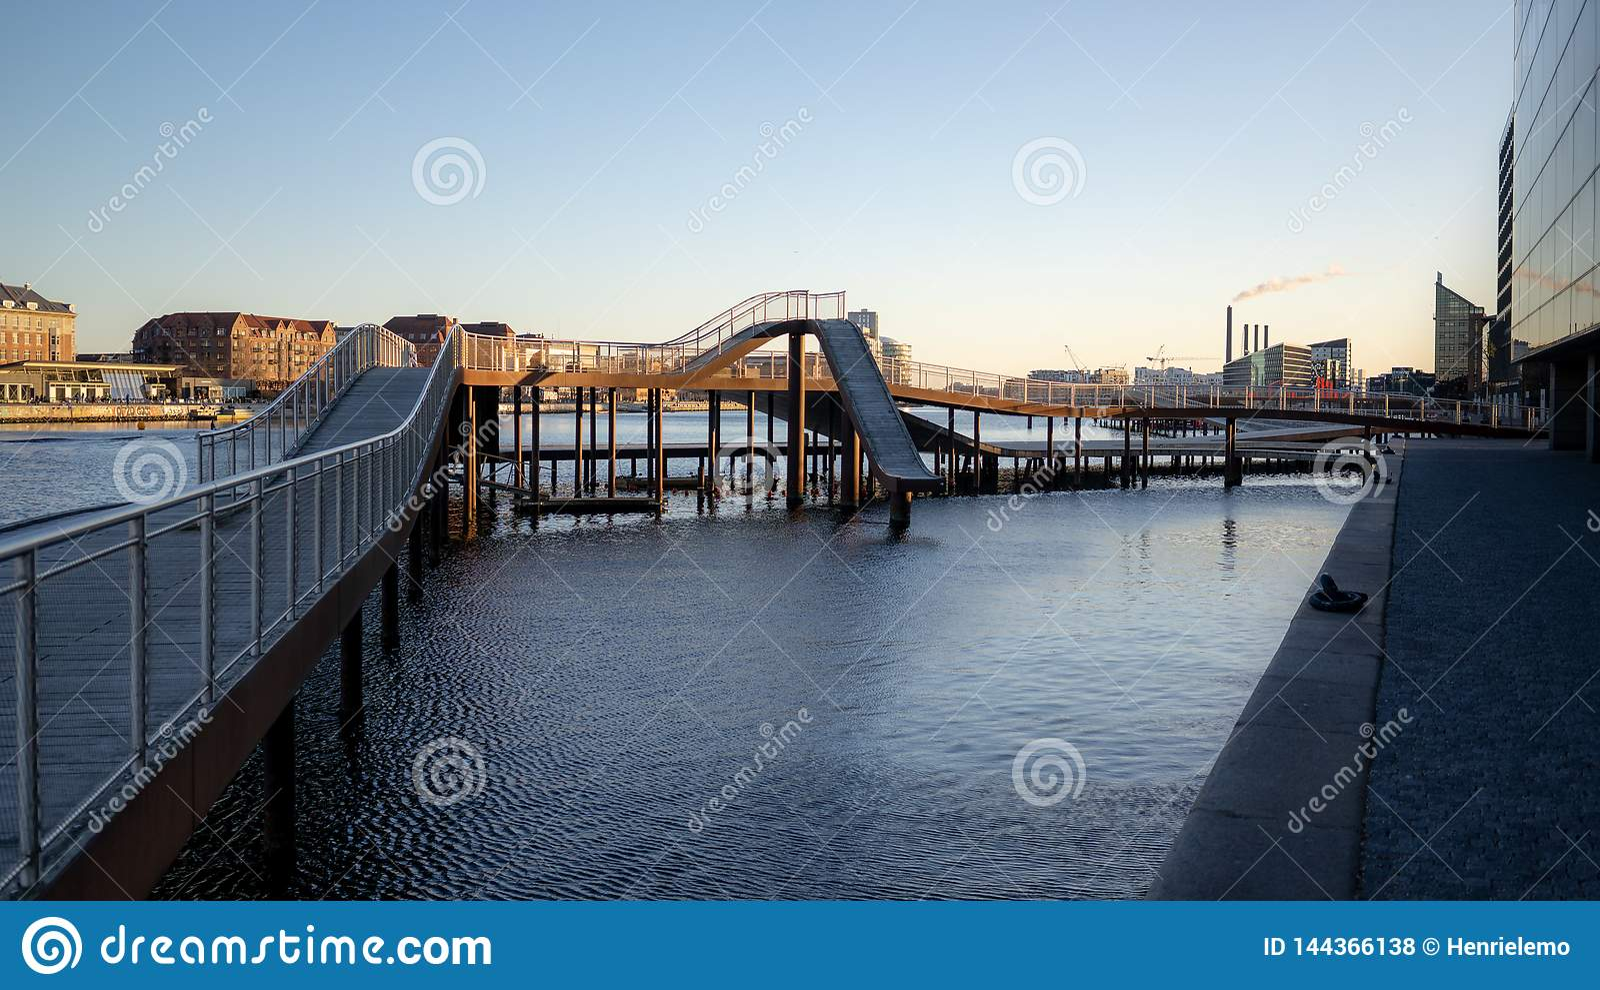 Копенгаген, Дания - 1-ое апреля 2019: Мост Kalvobod который современная структура